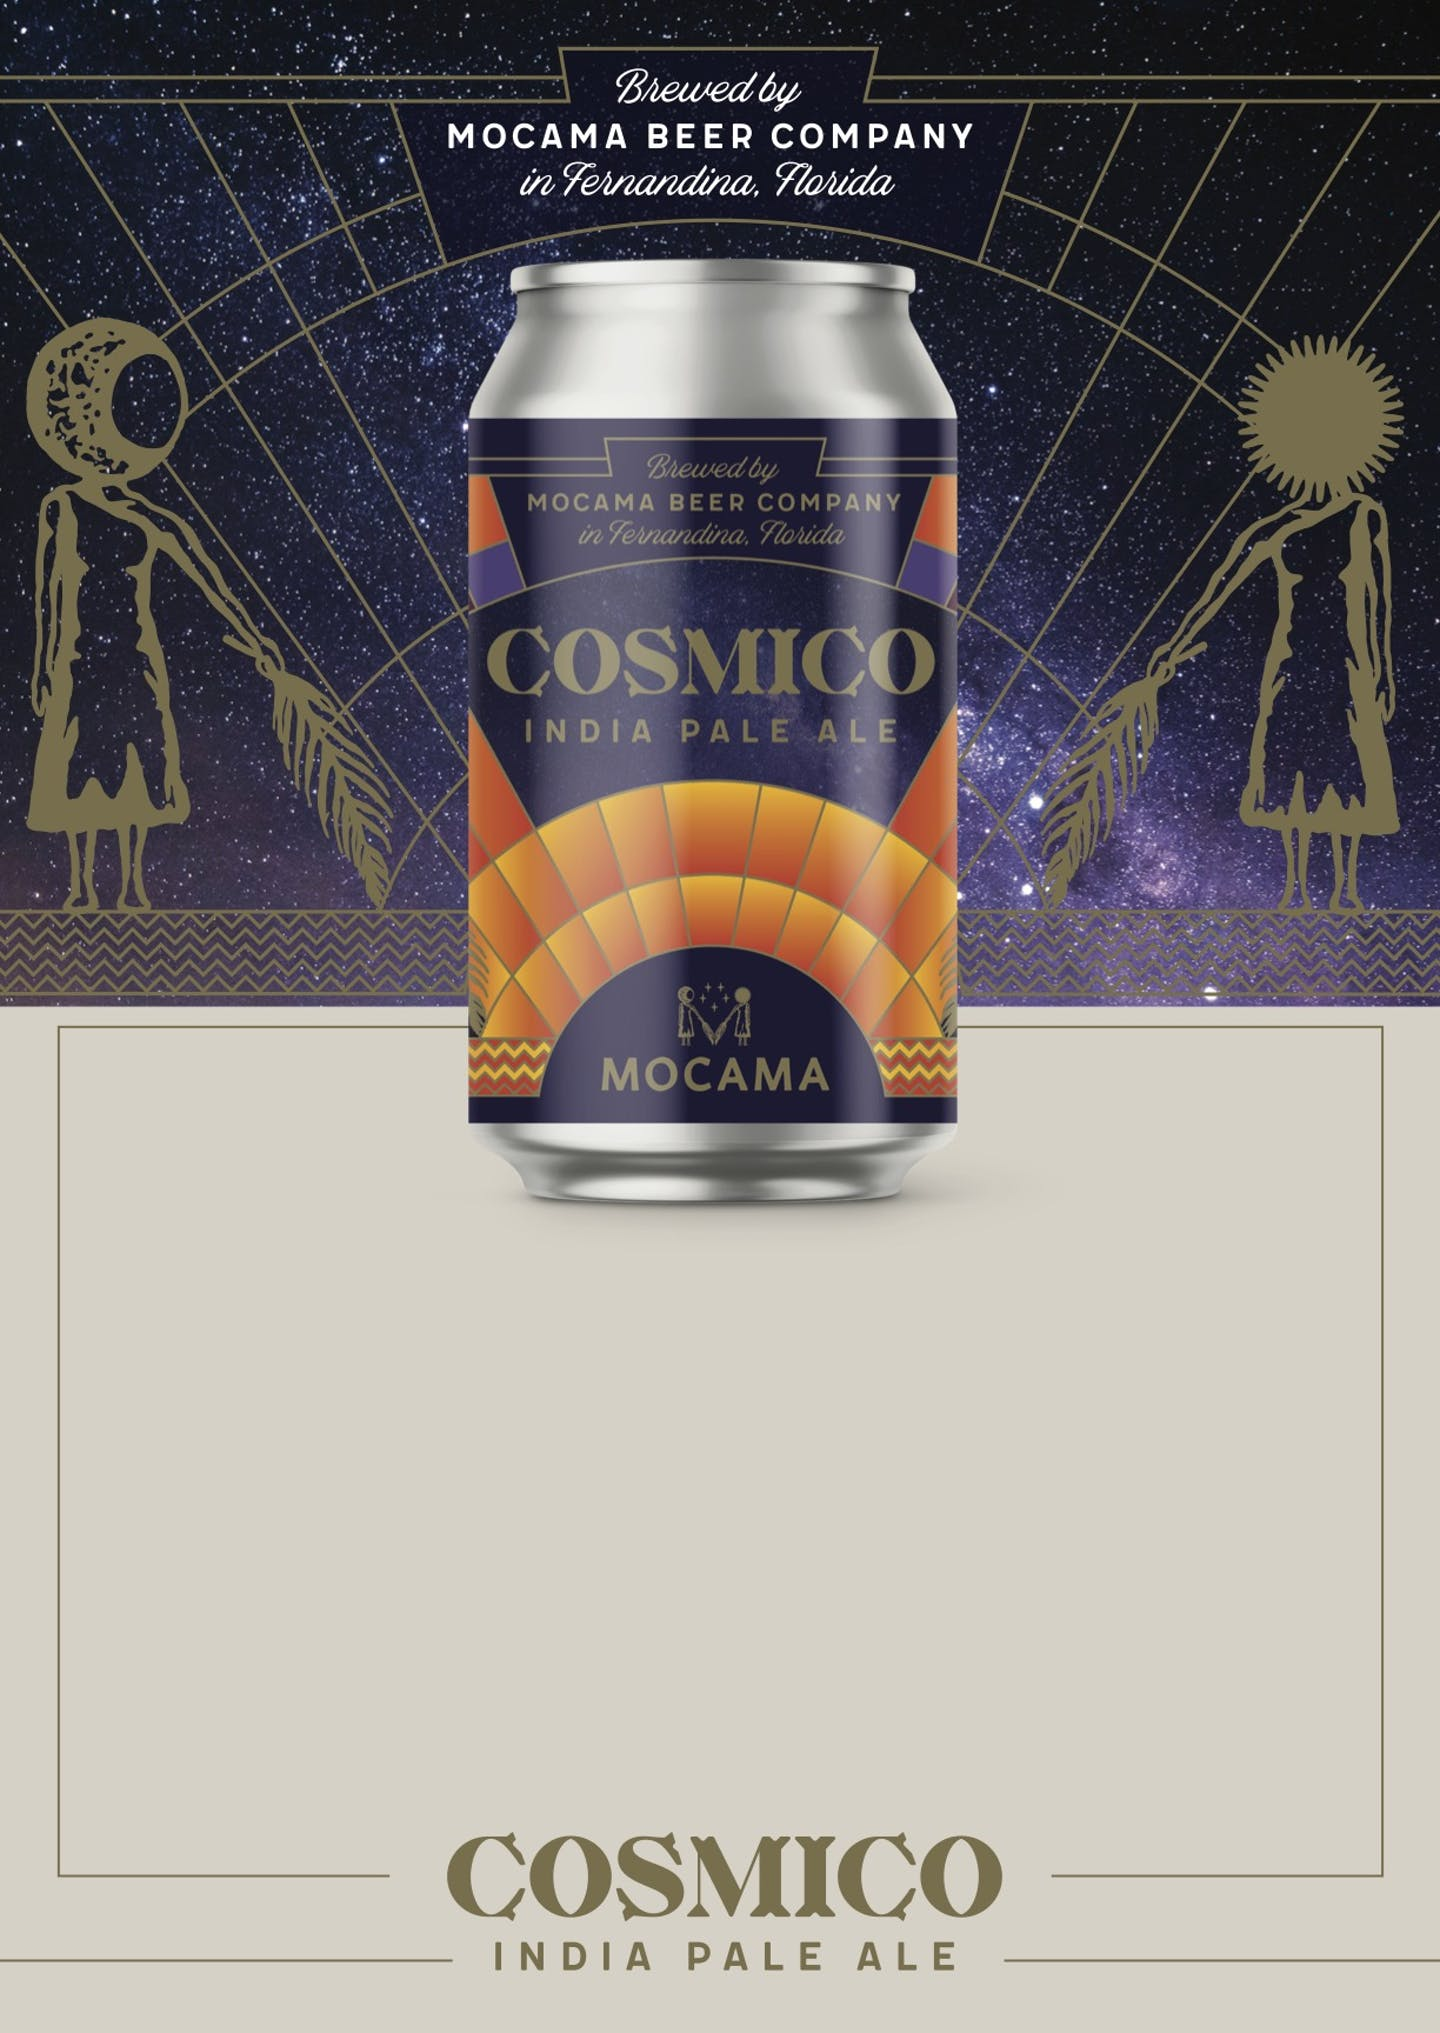 COSMICO PRICE CARD